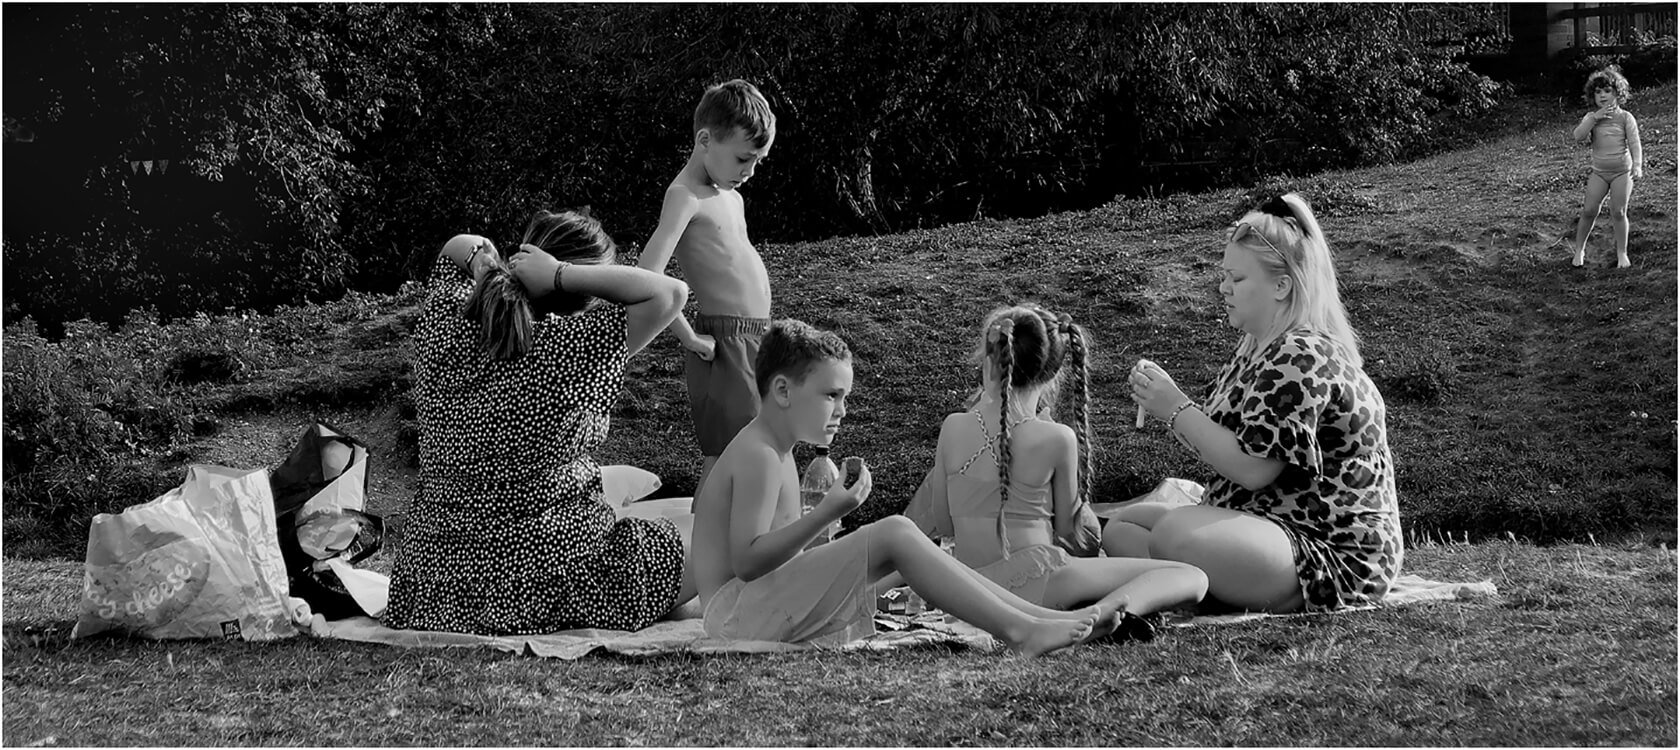 Photocraft Camera Club - Separation by Martin F